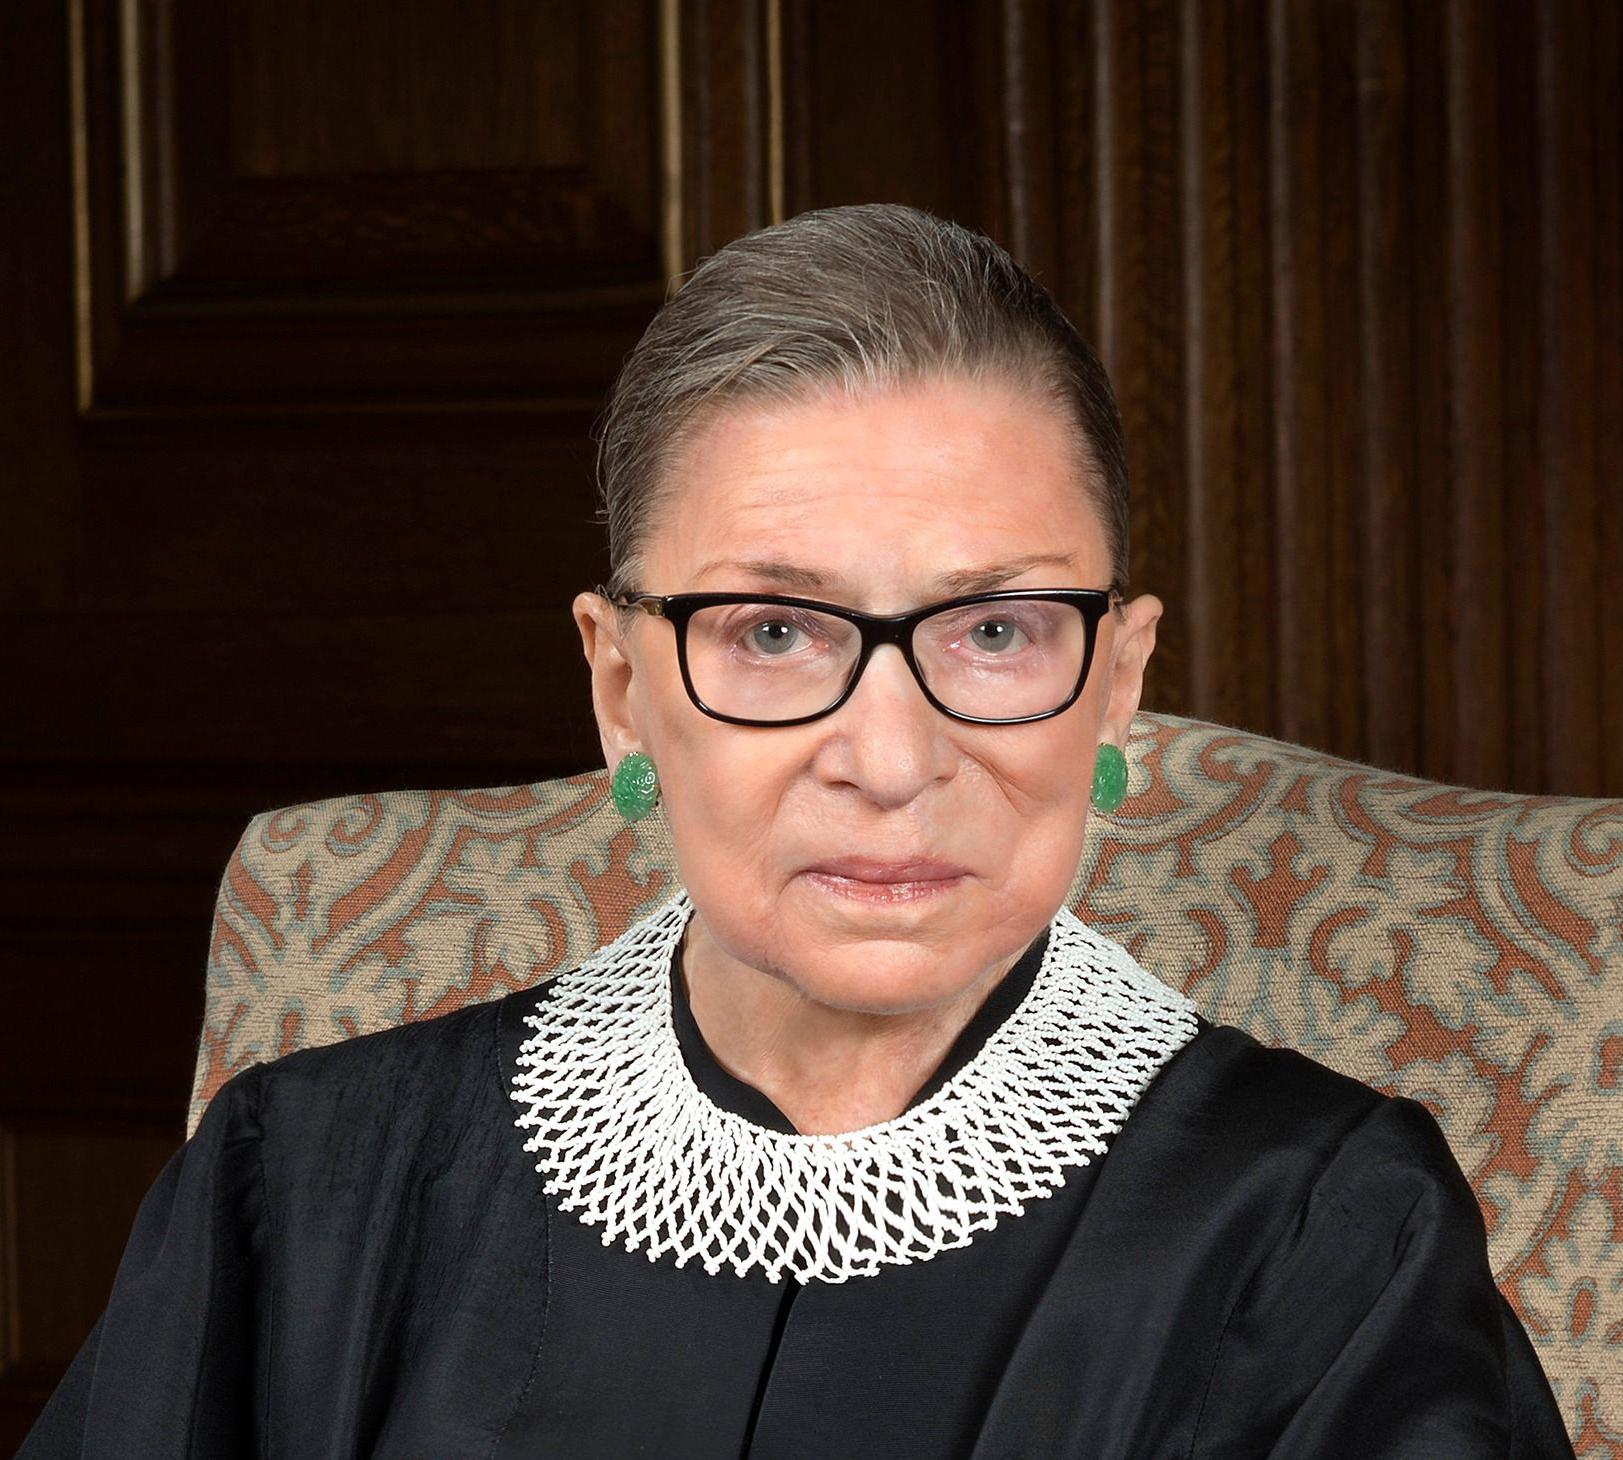 Headshot of U.S. Supreme Court Justice Ruth Bader Ginsburg